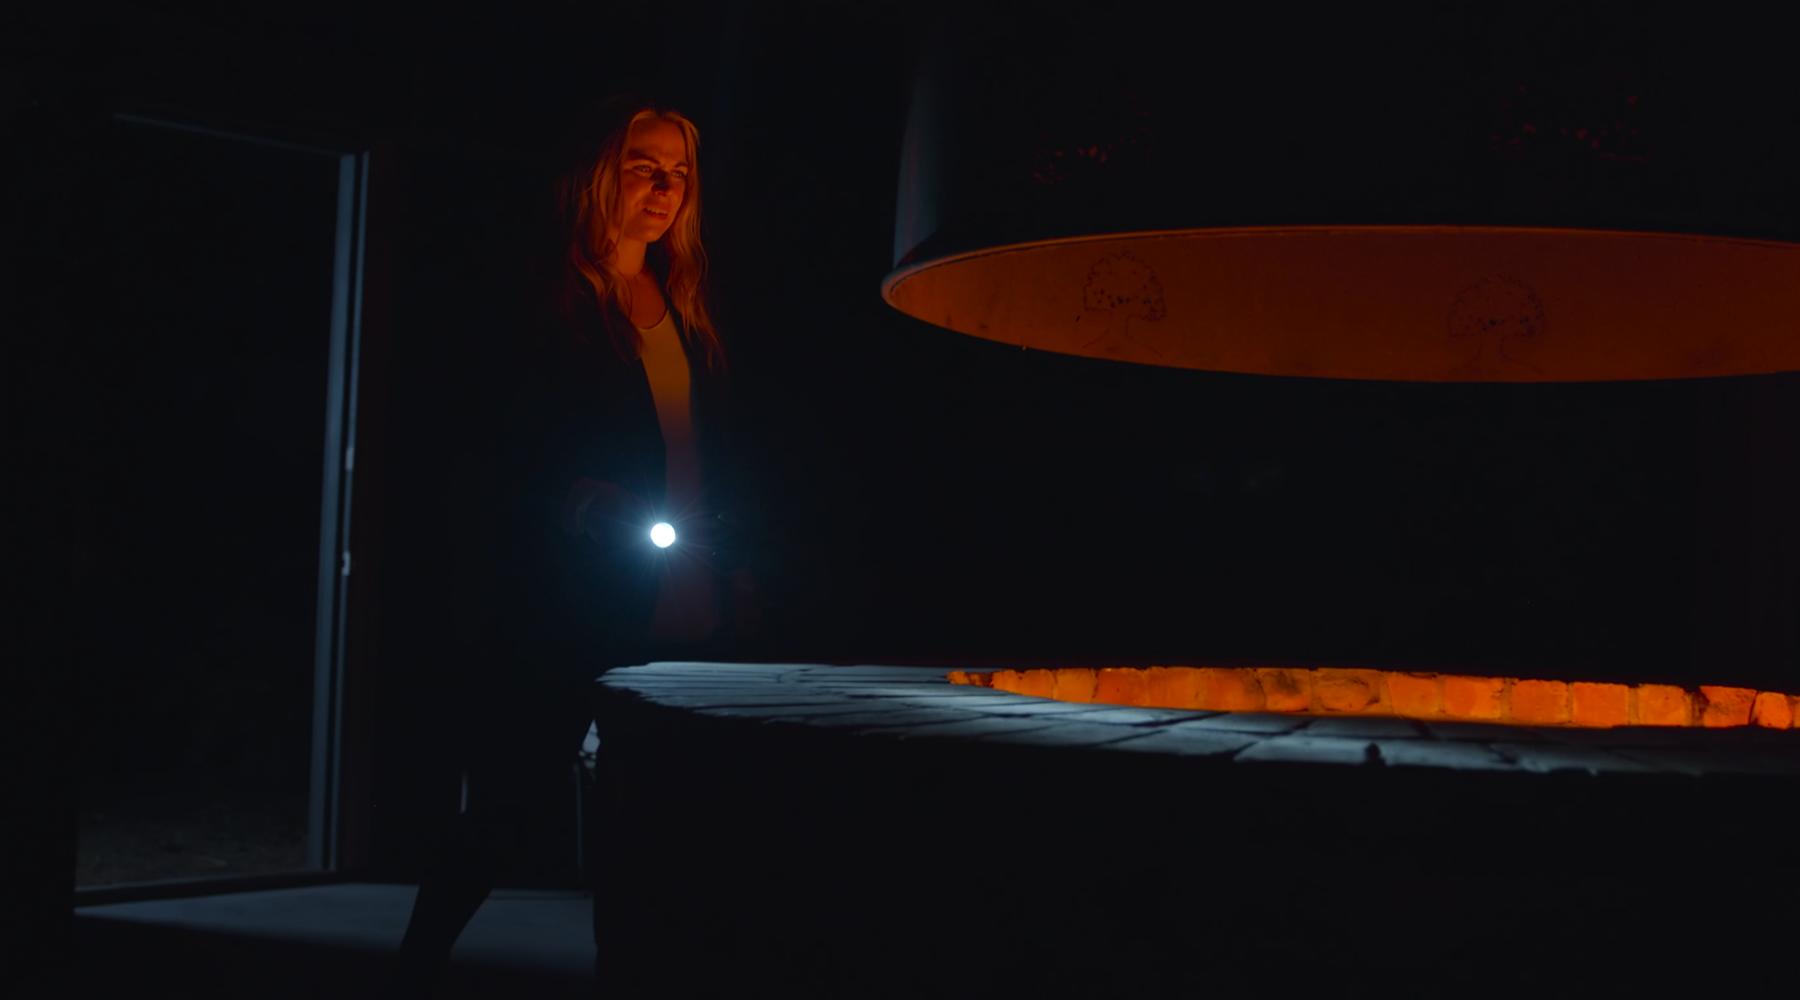 Exterior Lighting for a Horror Film - Fire Light